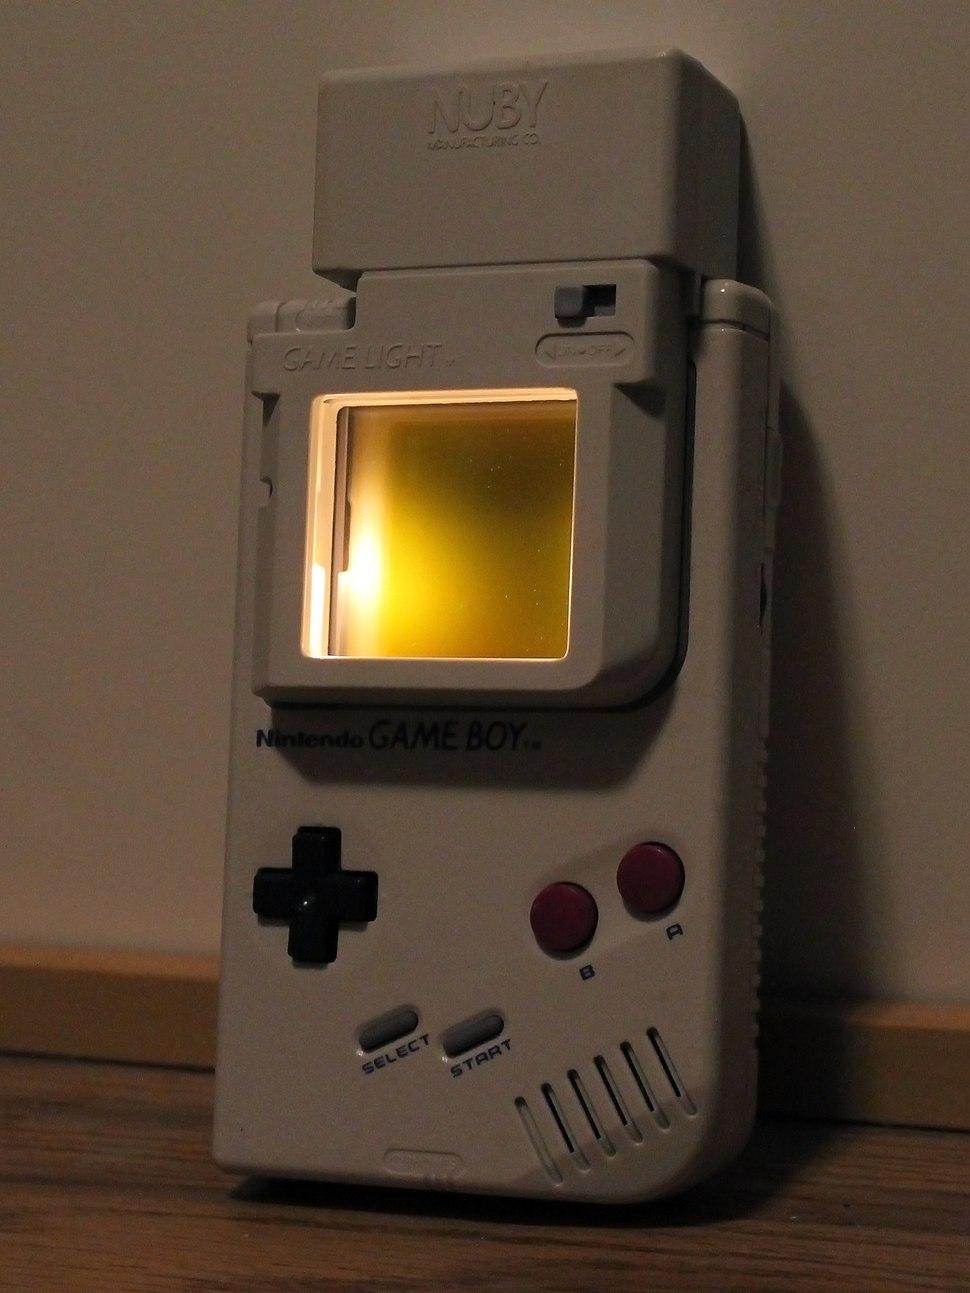 Gameboylight accessory-addon